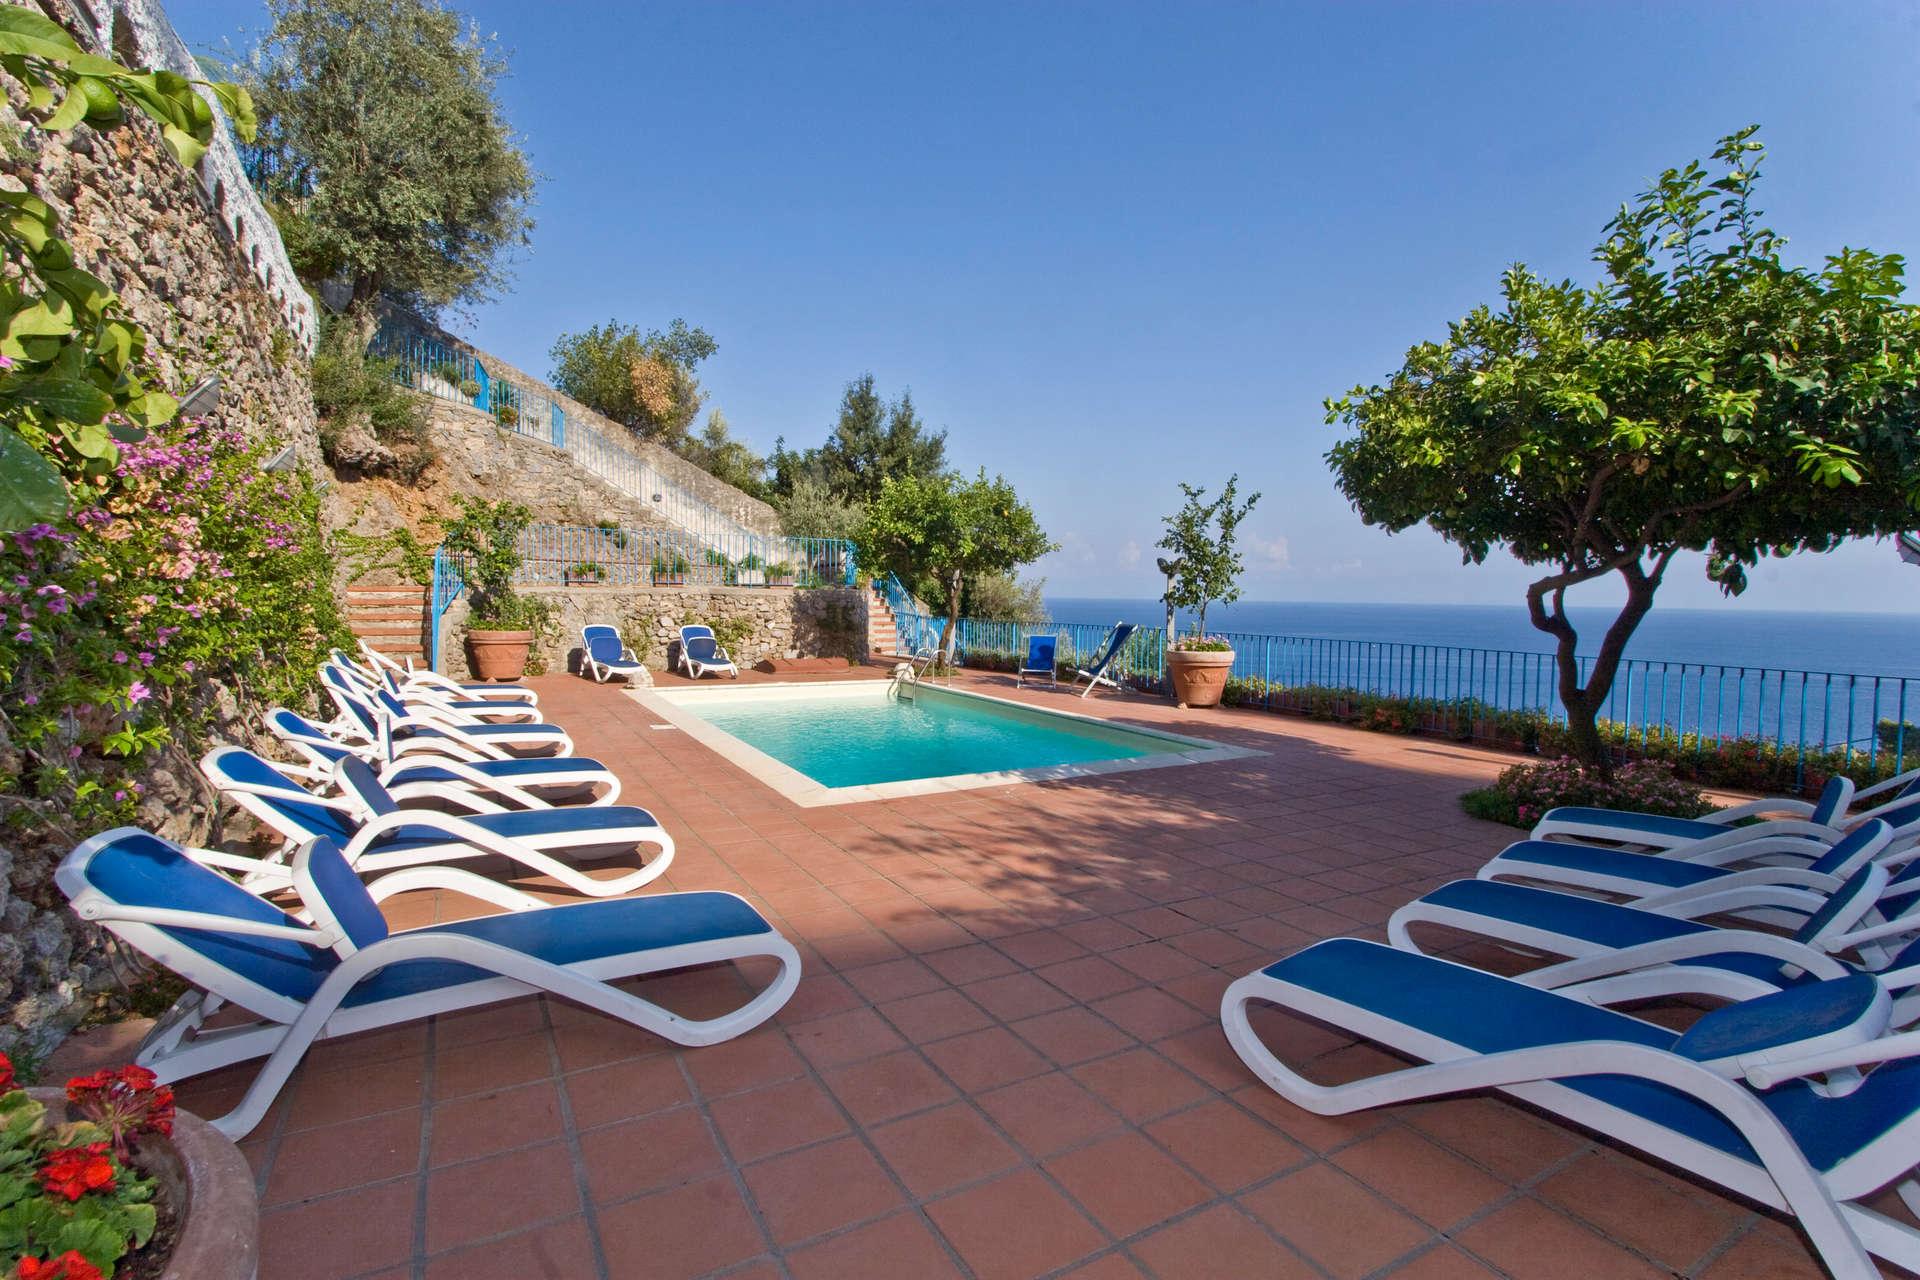 Luxury vacation rentals europe - Italy - Amalfi coast - Am alfi - Stella Villa - Image 1/23